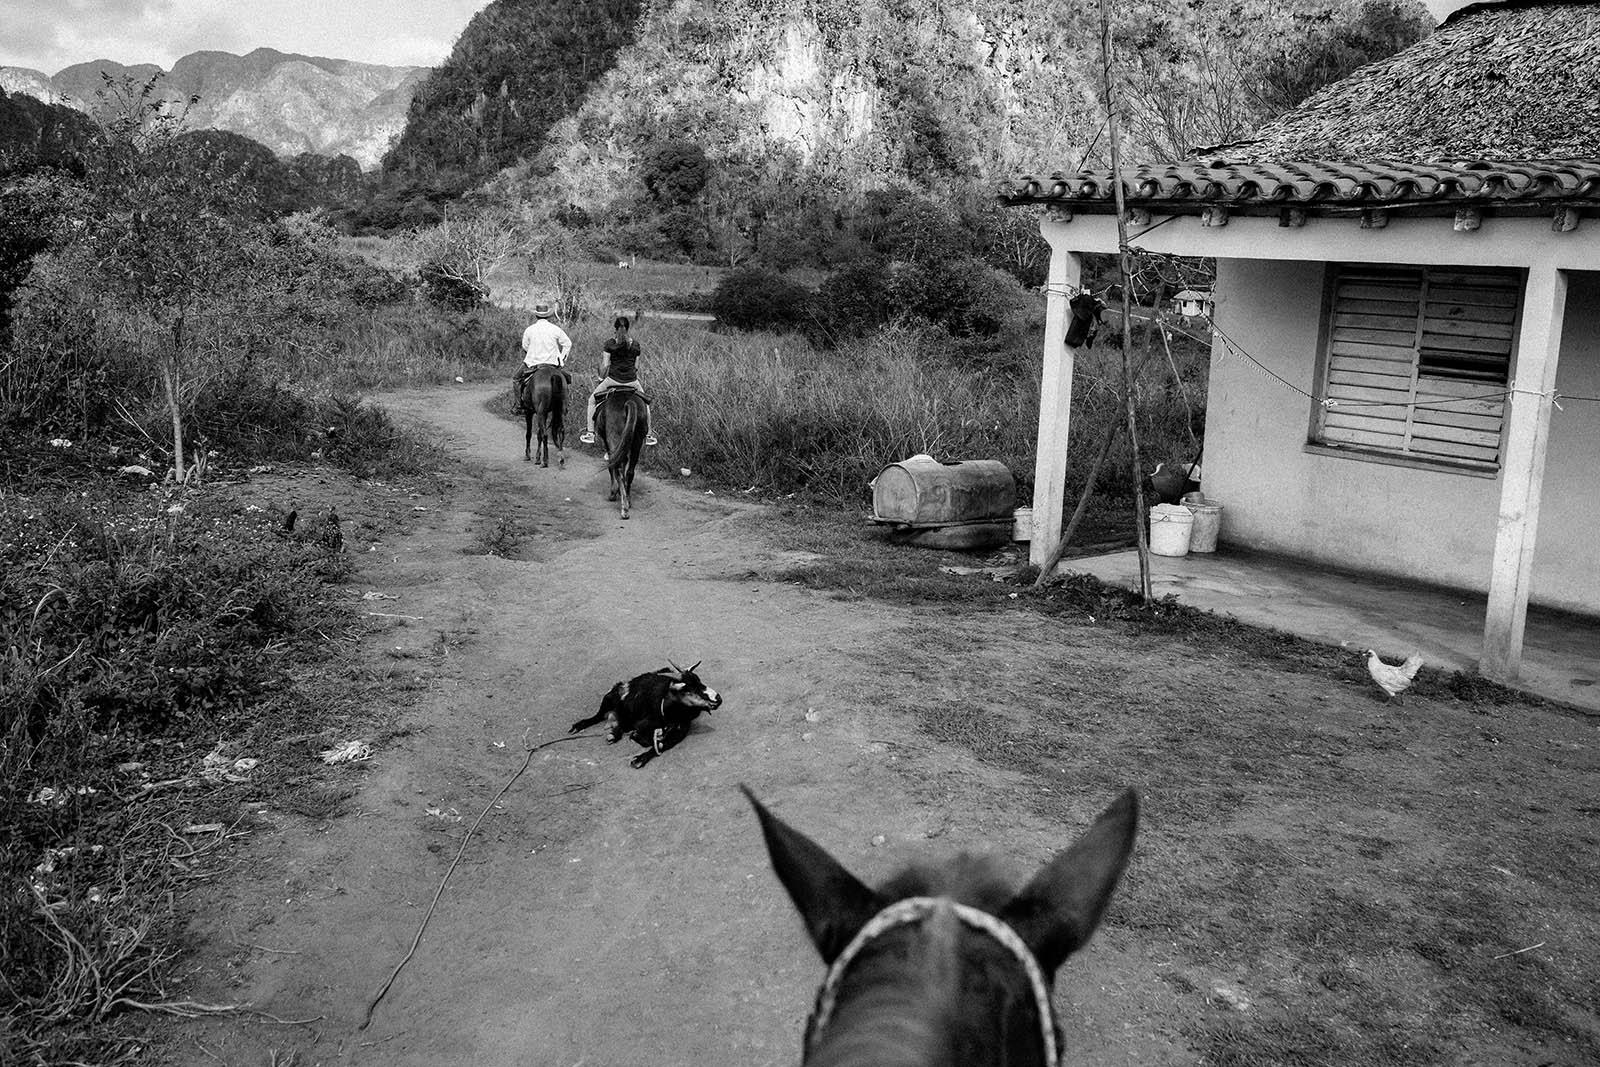 viñales cuba, photo essay, horse, cowboy